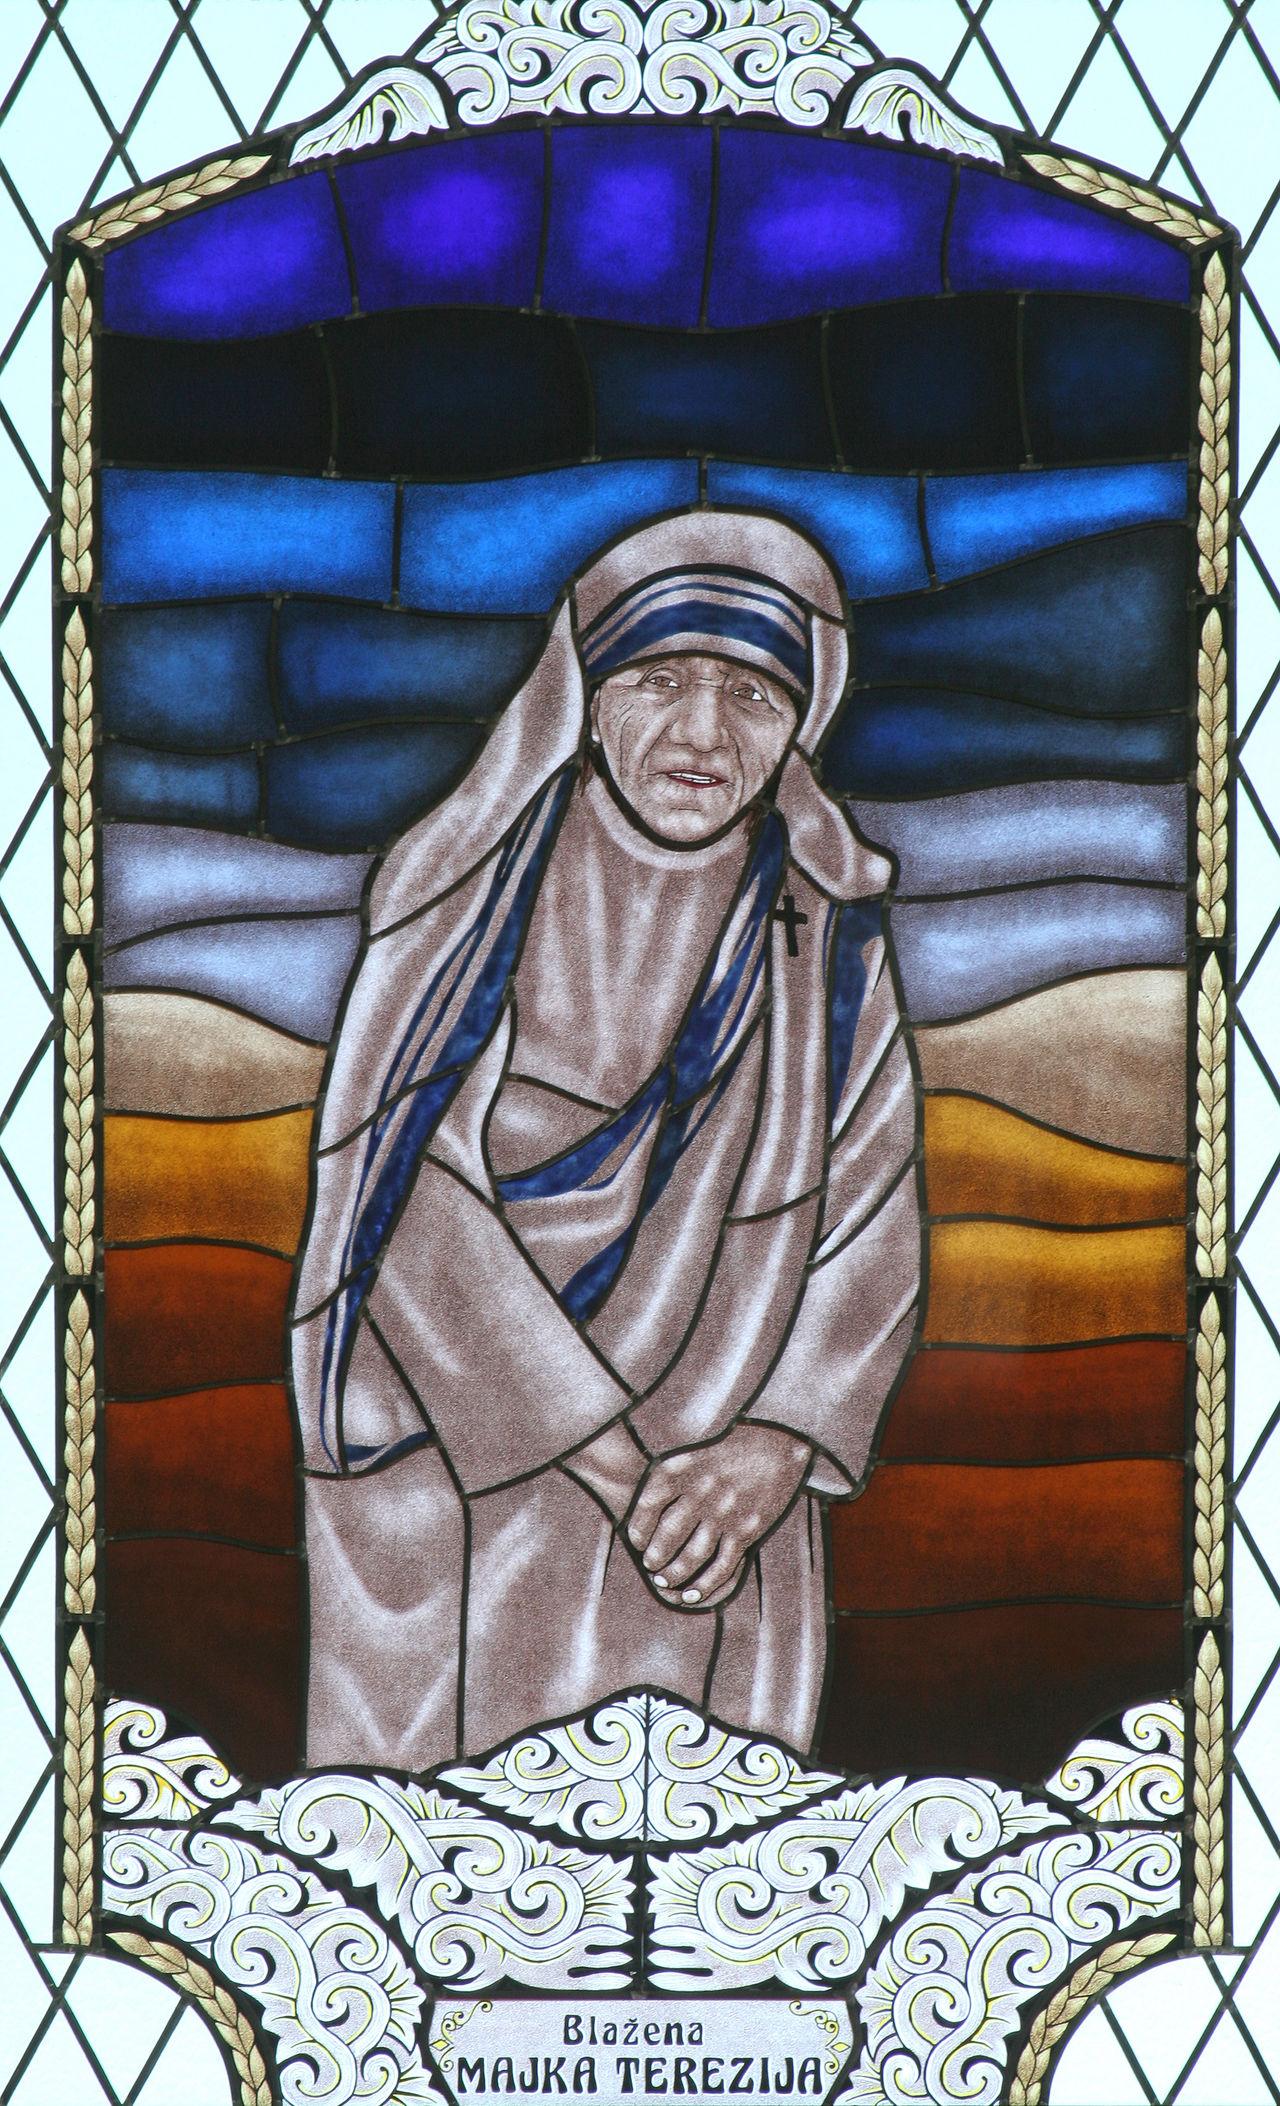 Saint Mother Teresa Belief Christianity Church Croatia Faith Holy Mother Mother Teresa Religion Religious  Saint Spirituality Stained Glass Teresa Window Windowpane Worship